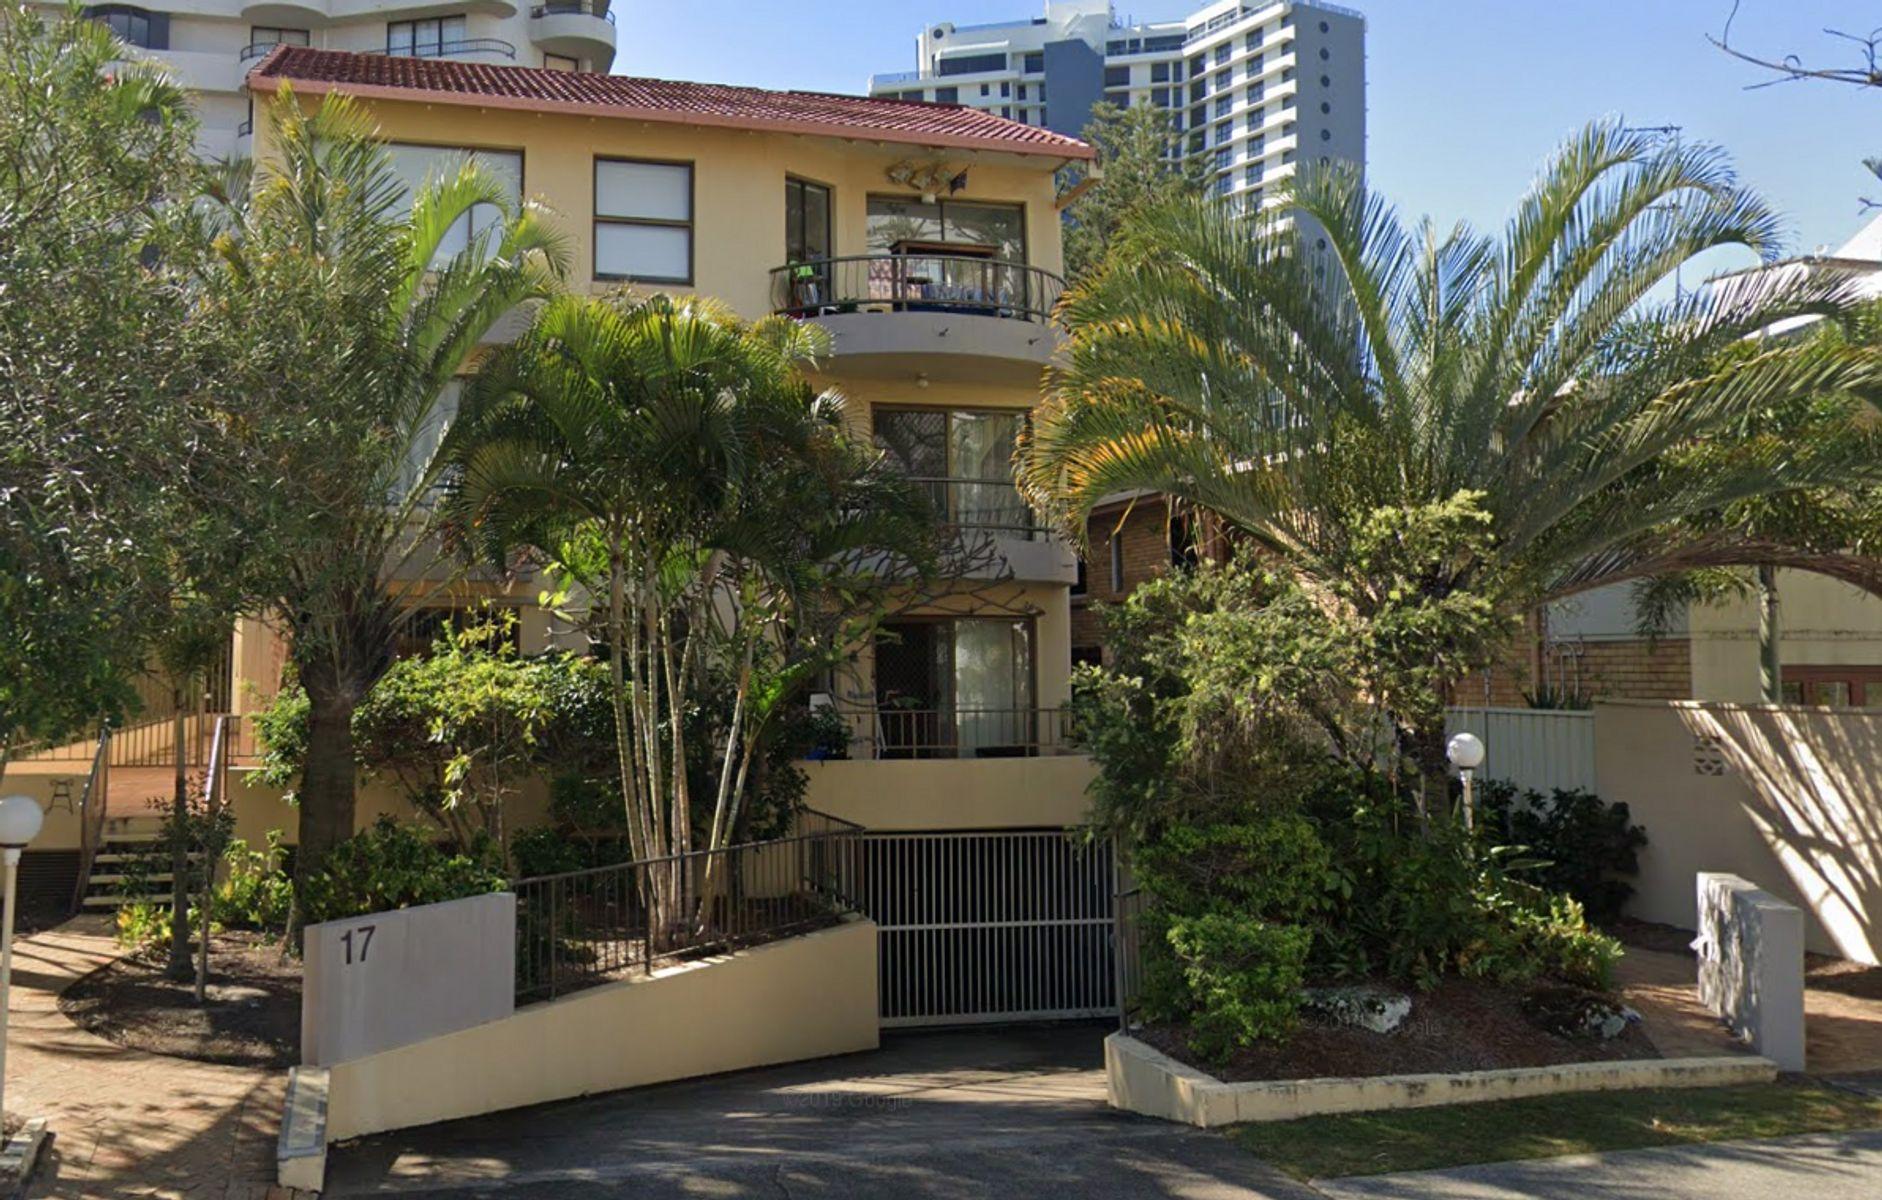 6/17 Frederick Street, Surfers Paradise, QLD 4217